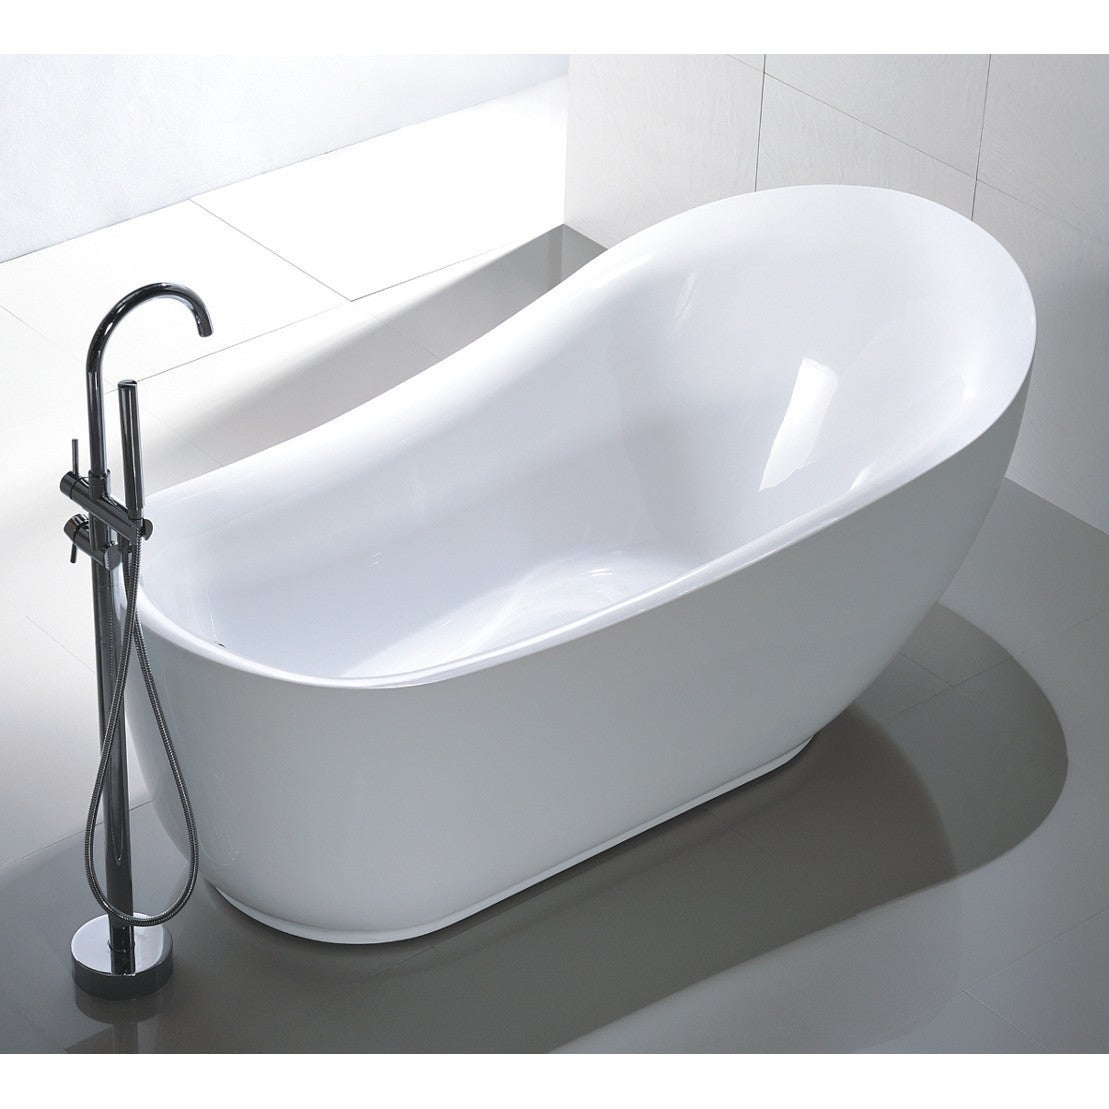 Vanity Art Freestanding White Acrylic 71-Inch Soaking Bathtub - Free ...